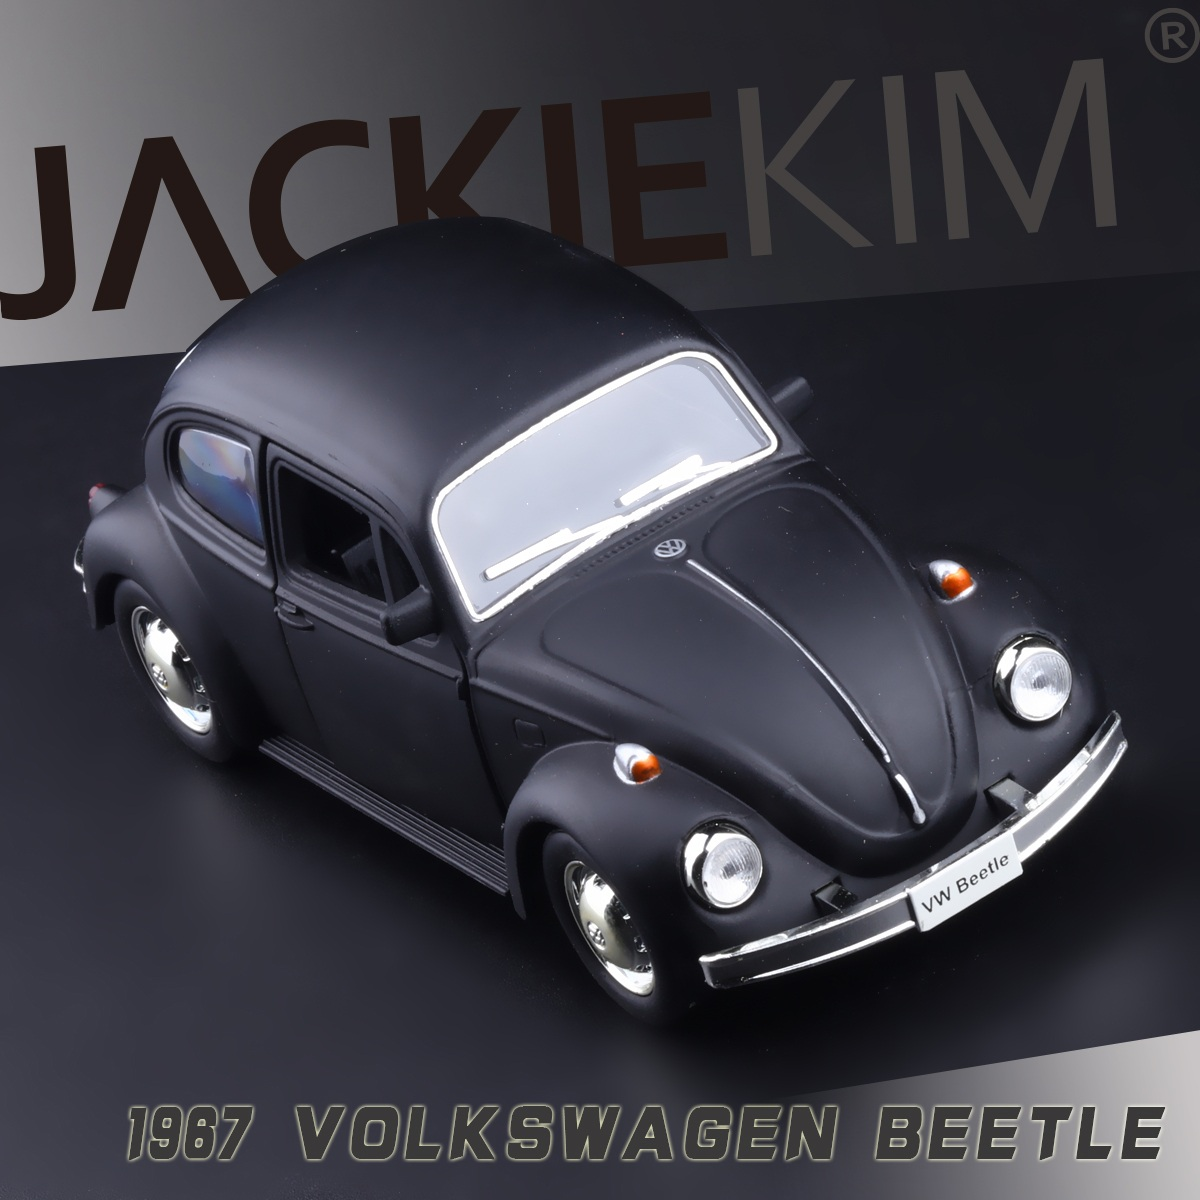 Buy Volkswagen: Popular Vw Beetle Toy-Buy Cheap Vw Beetle Toy Lots From